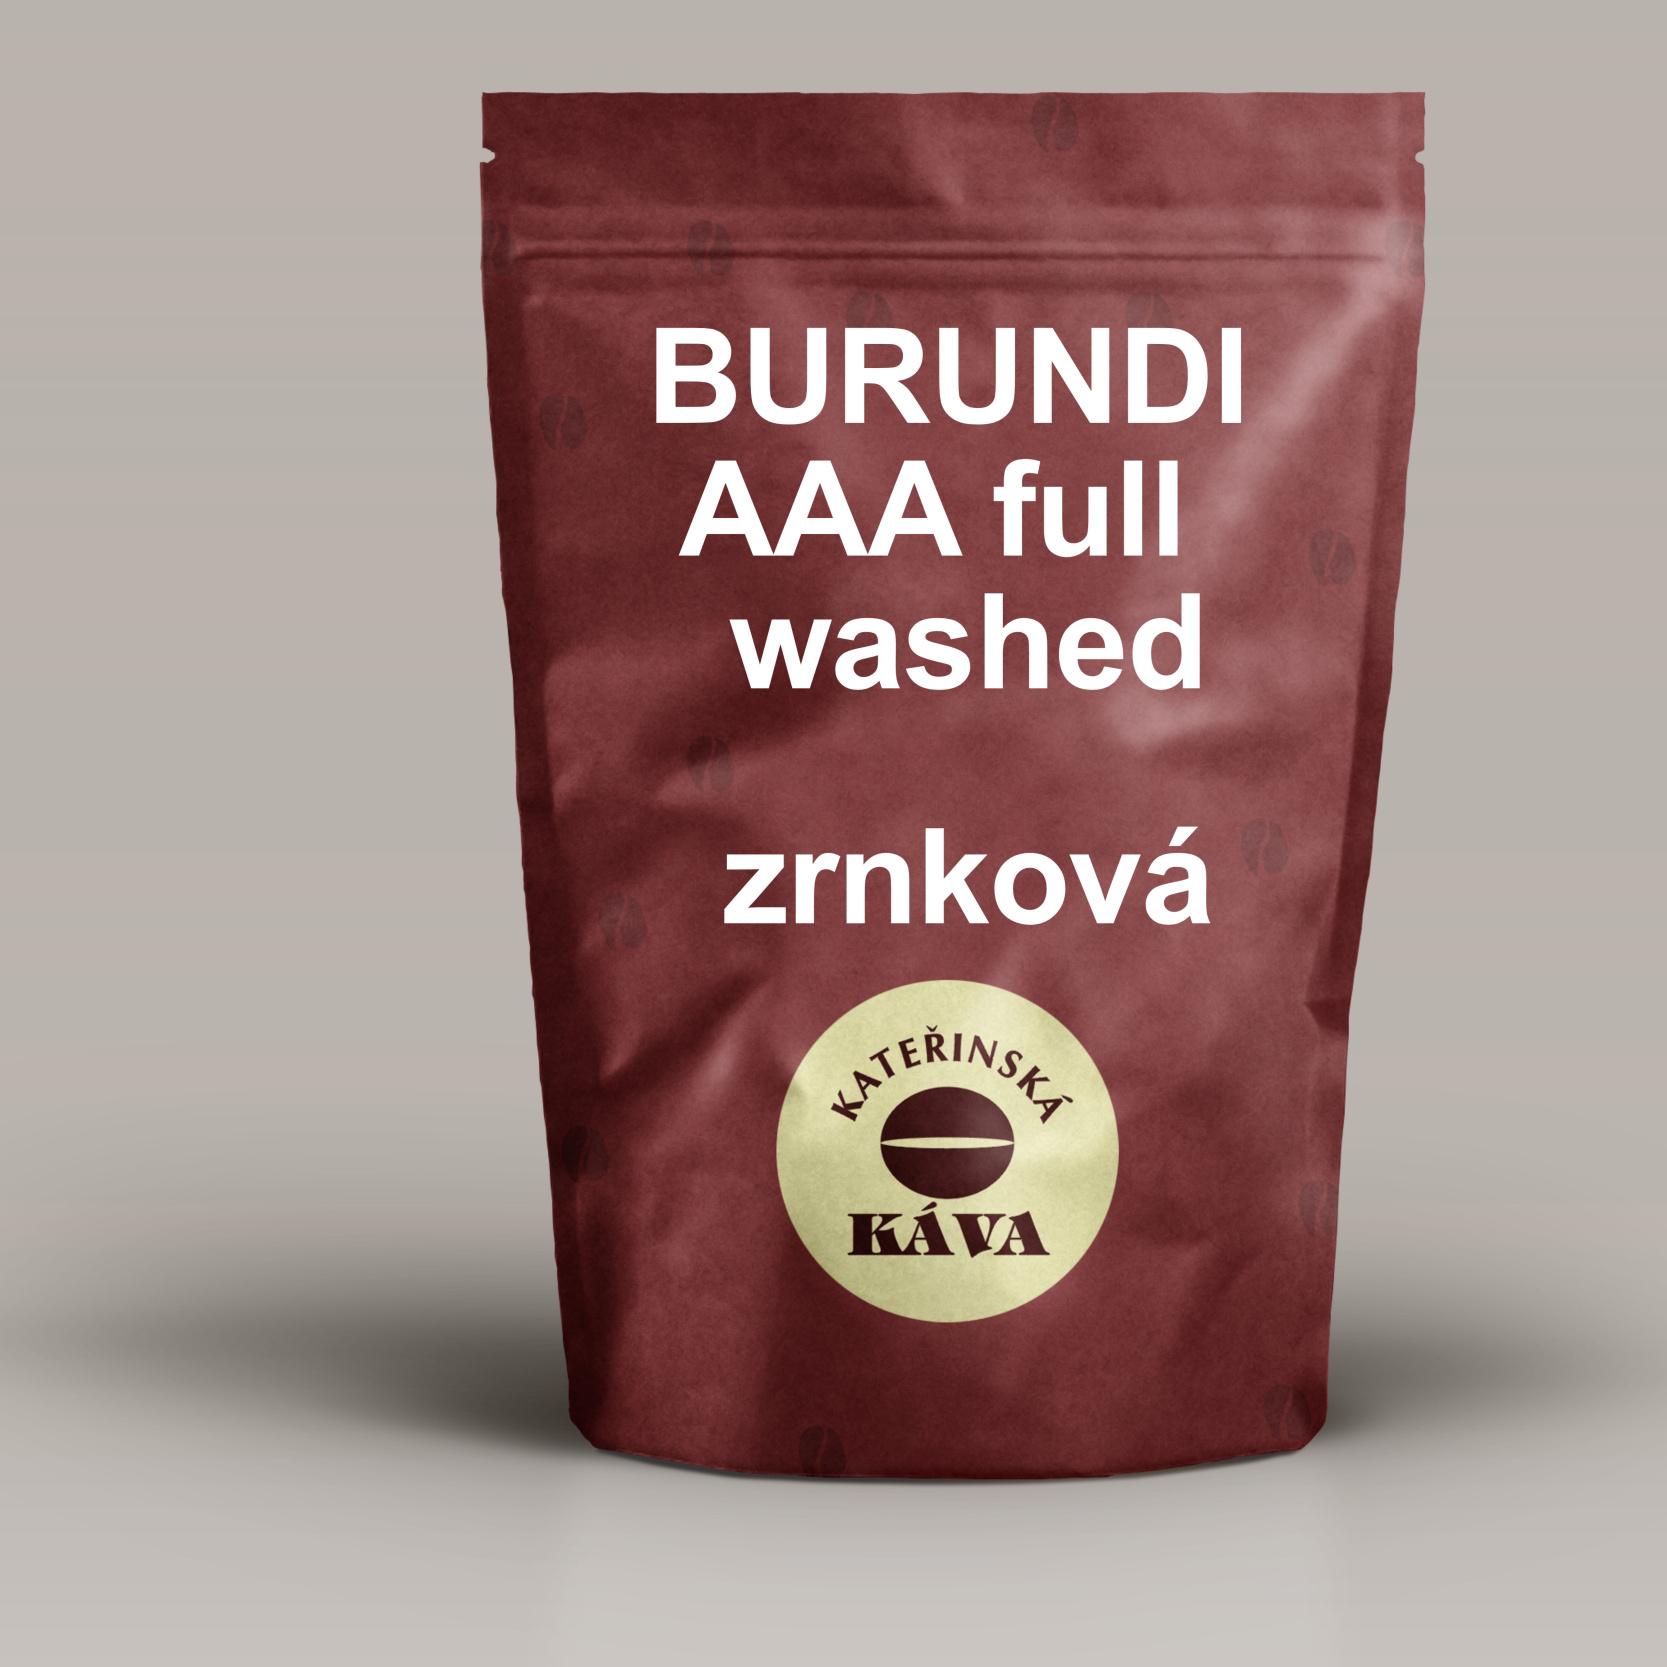 BURUNDI AAA Full Washed -zrnková